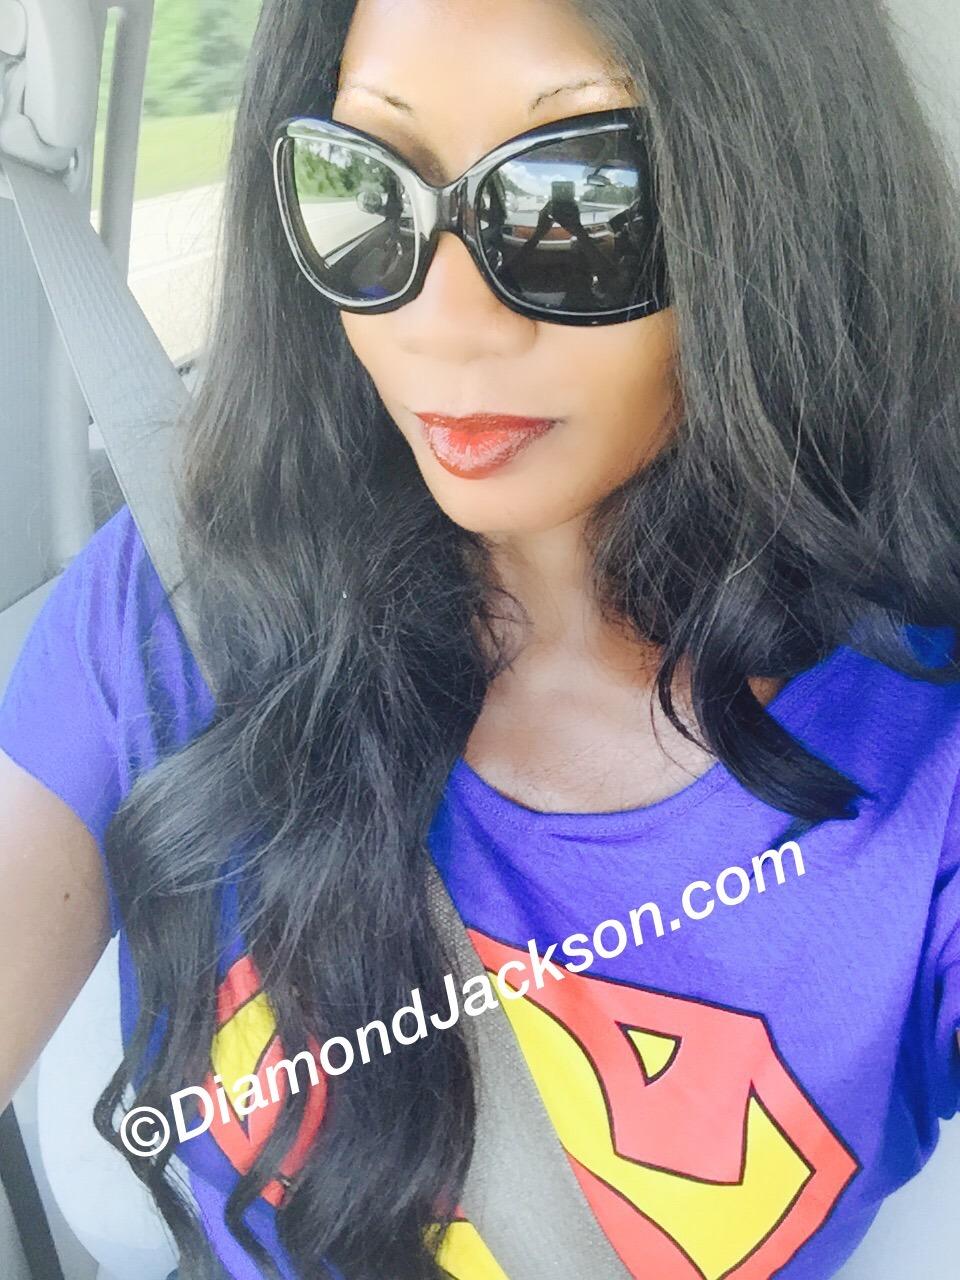 DiamondJackson - profile image - 3